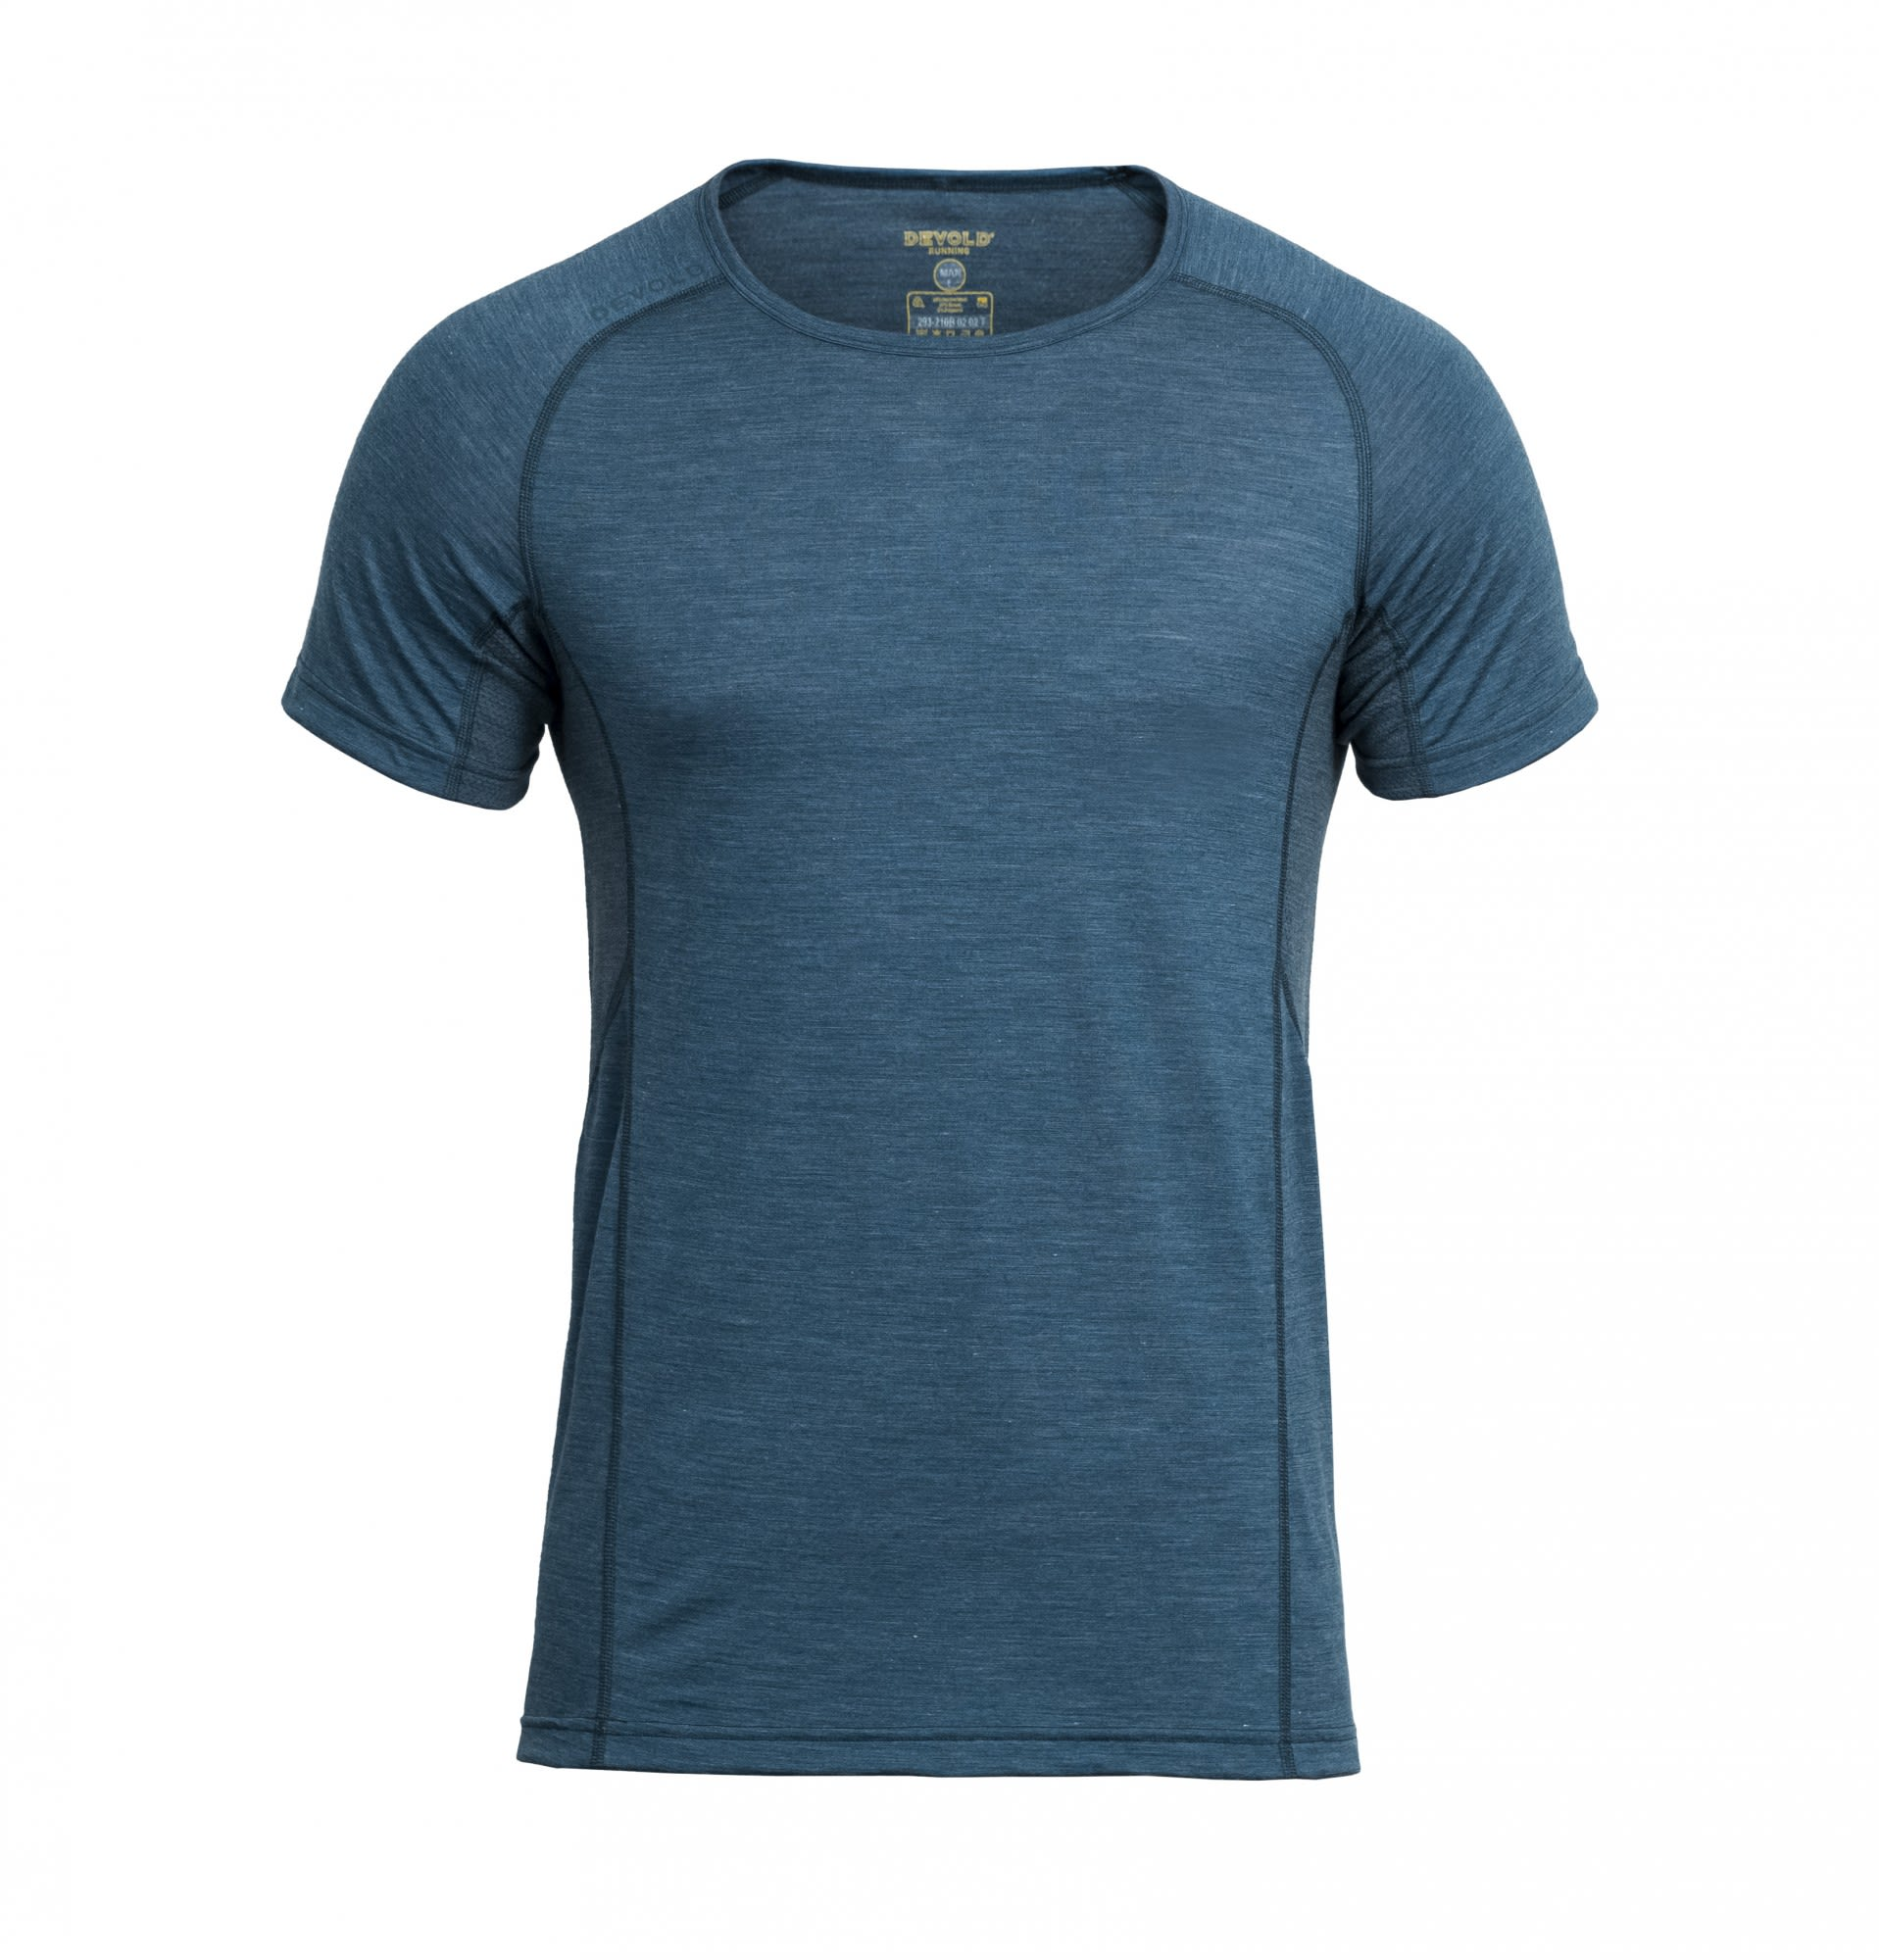 Devold Running MAN T-Shirt Blau, Male Merino XL -Farbe Subsea, XL